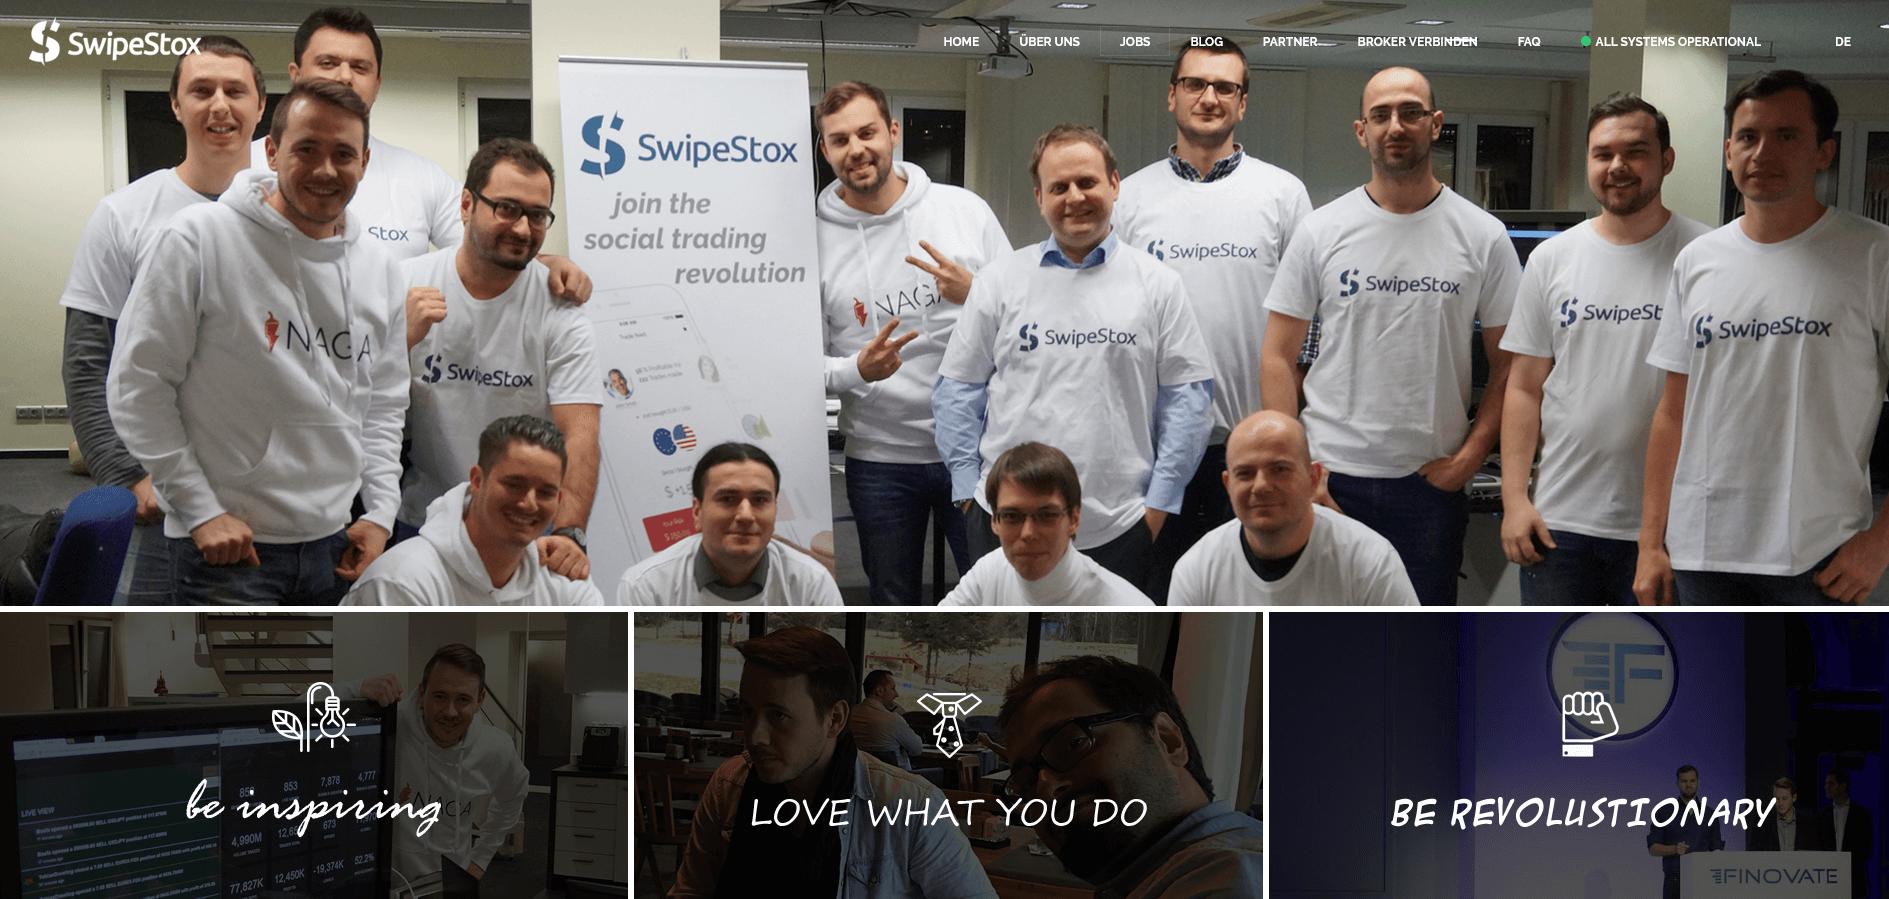 Jobs bei SwipeStox